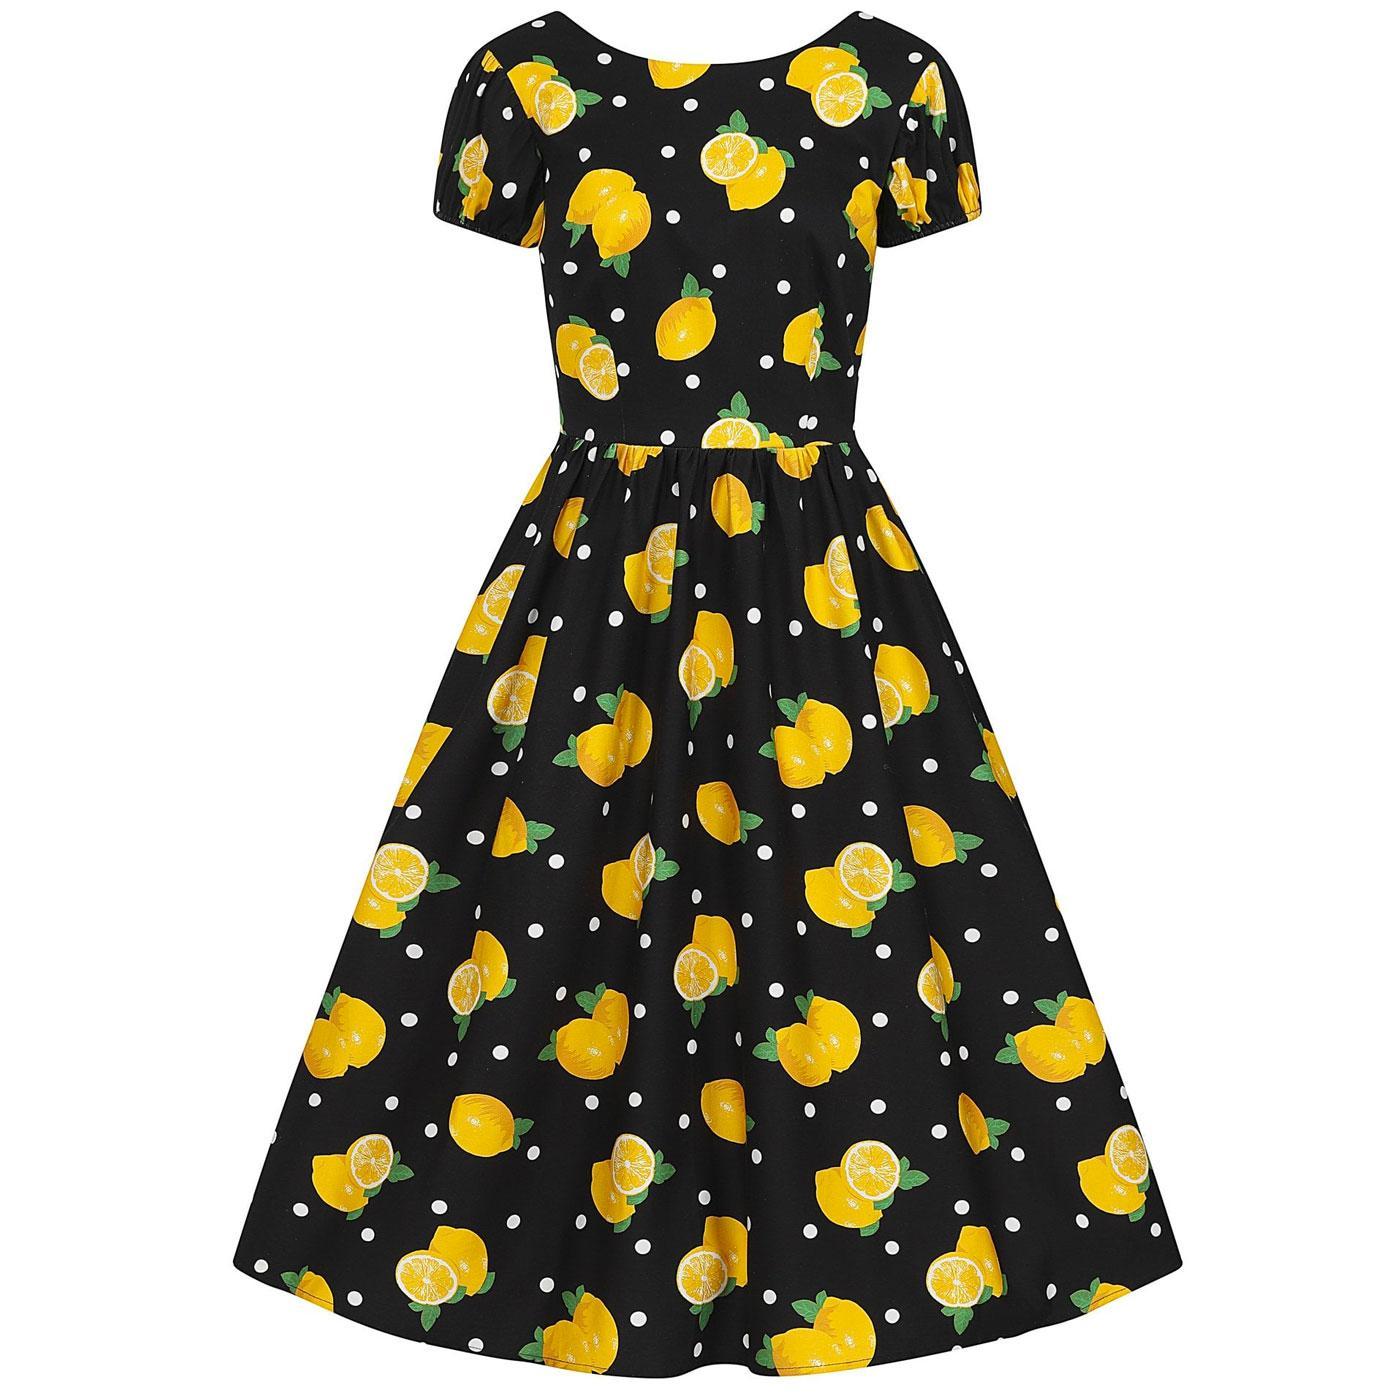 Demira COLLECTIF Retro 50s Lemon Print Swing Dress